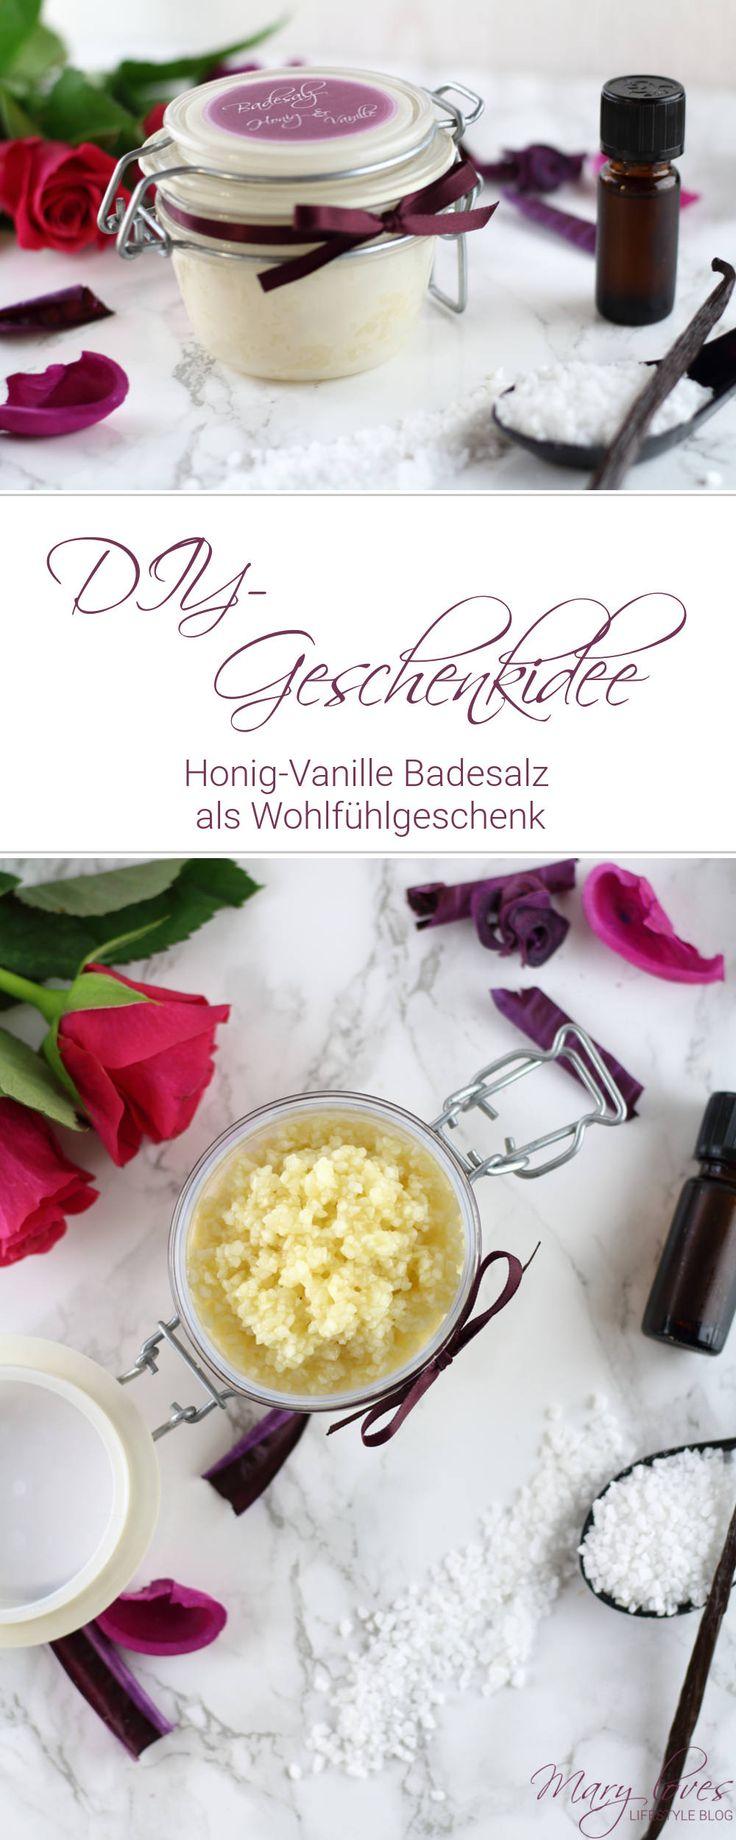 DIY-Geschenkidee - Honig-Vanille Badesalz als Wohlfühlgeschenk für den Winter - Badesalz selber machen - #badesalz #diybadesalz #diygeschenkidee #geschenkidee